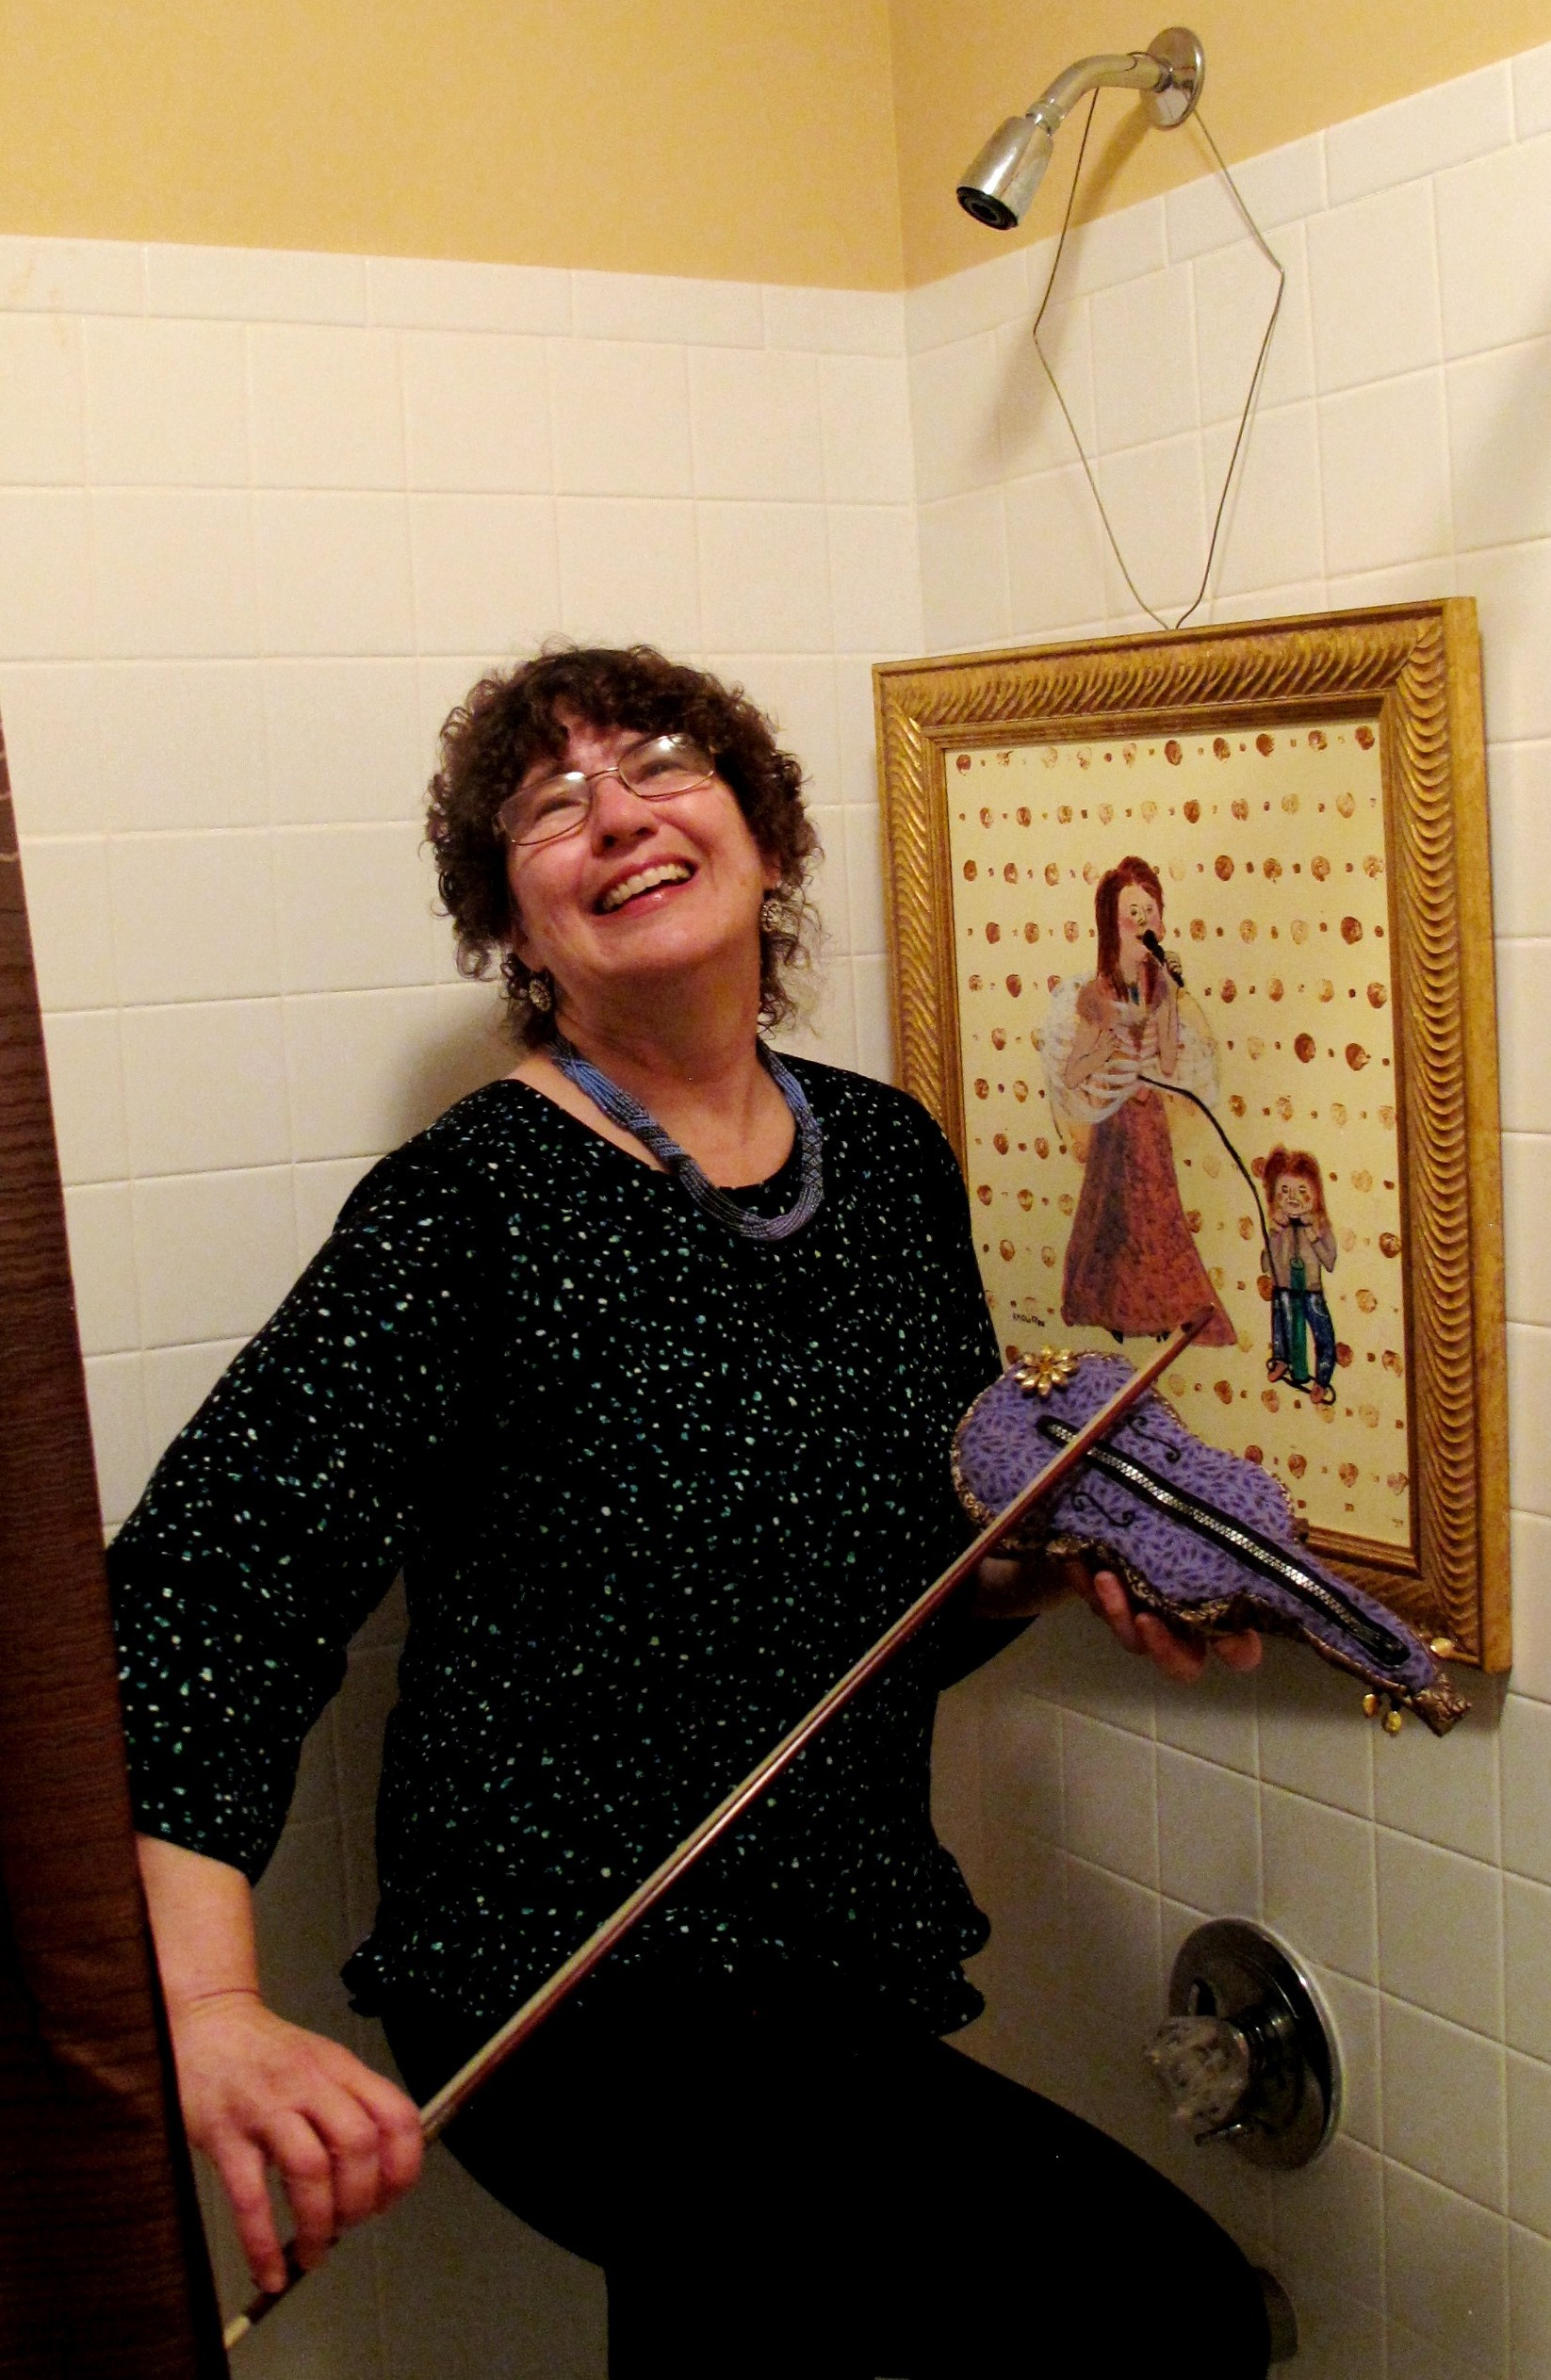 becky posing in shower violin Pam.JPG